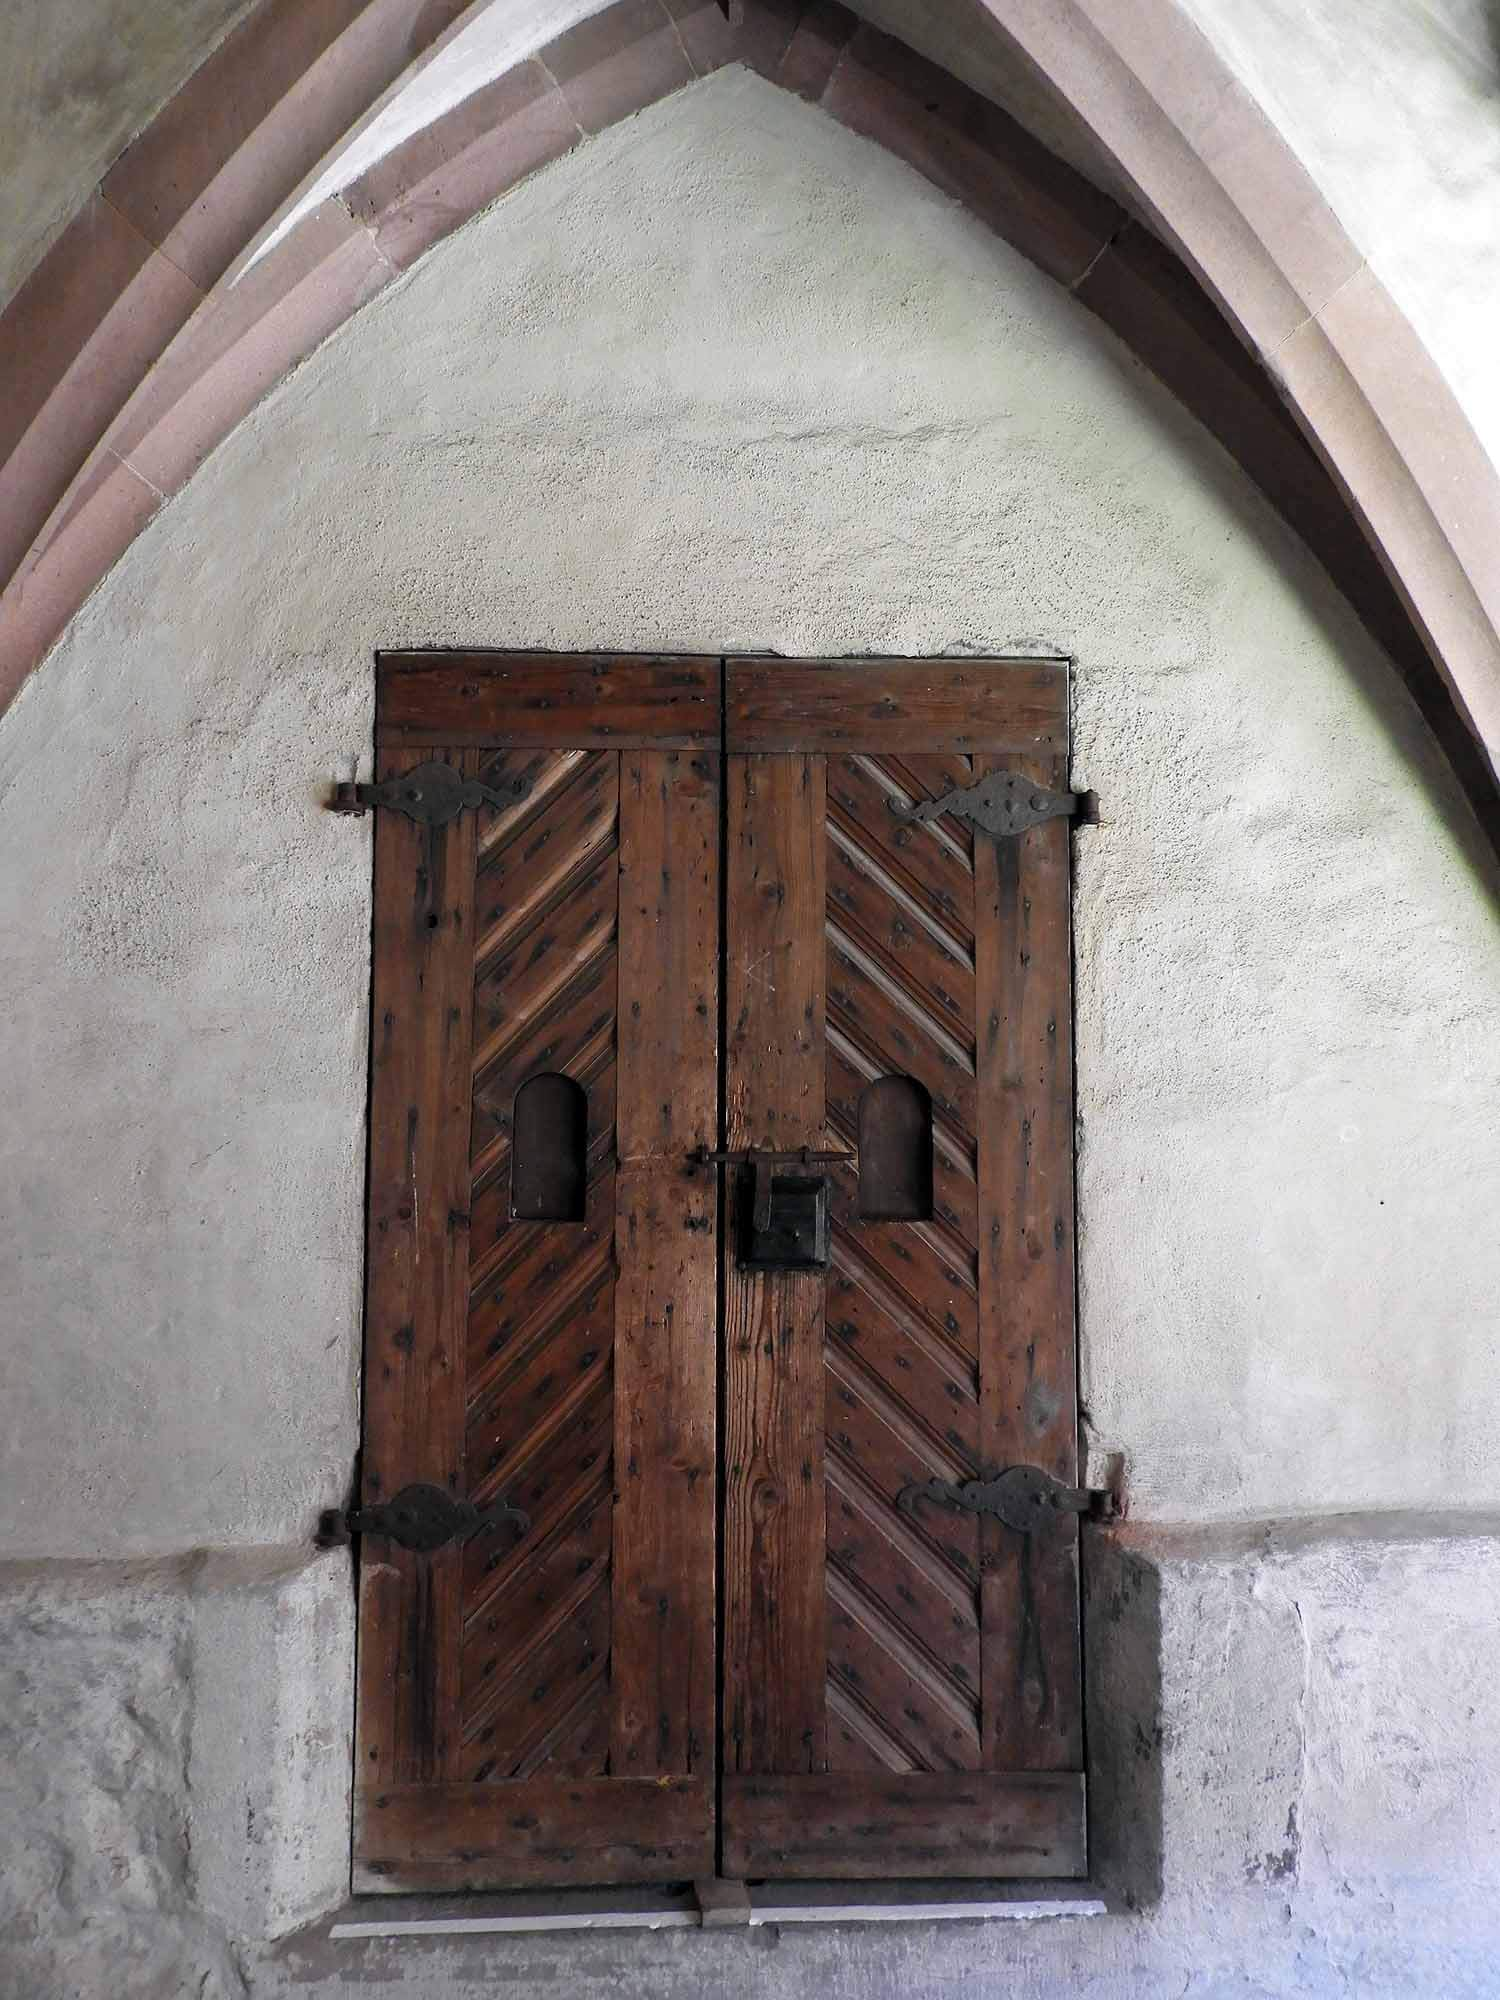 germany-alpirsbach-kloster-monestary-wood-door.JPG